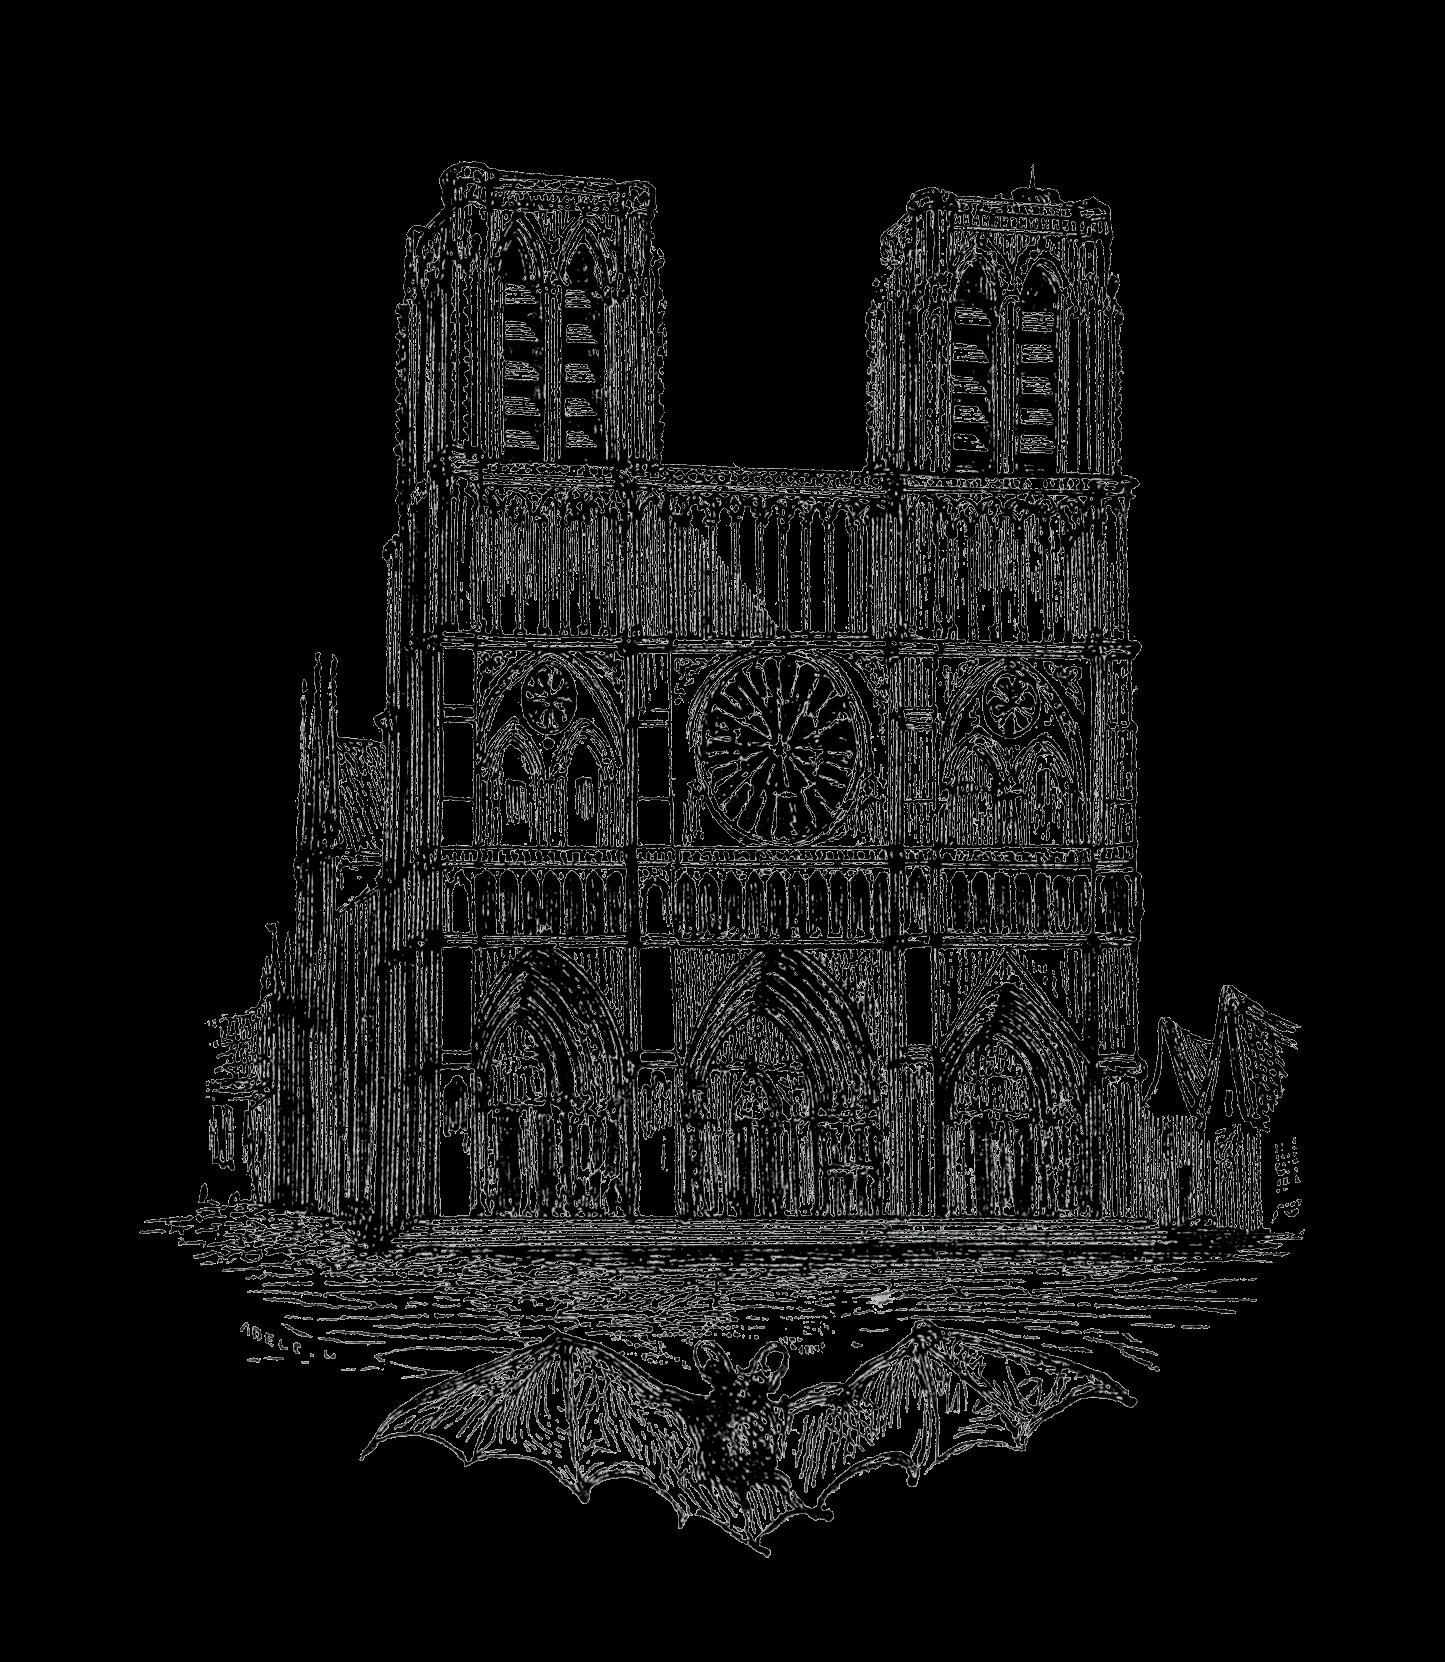 Notre Dame De Paris Manuscript Of History Historiae Secrets